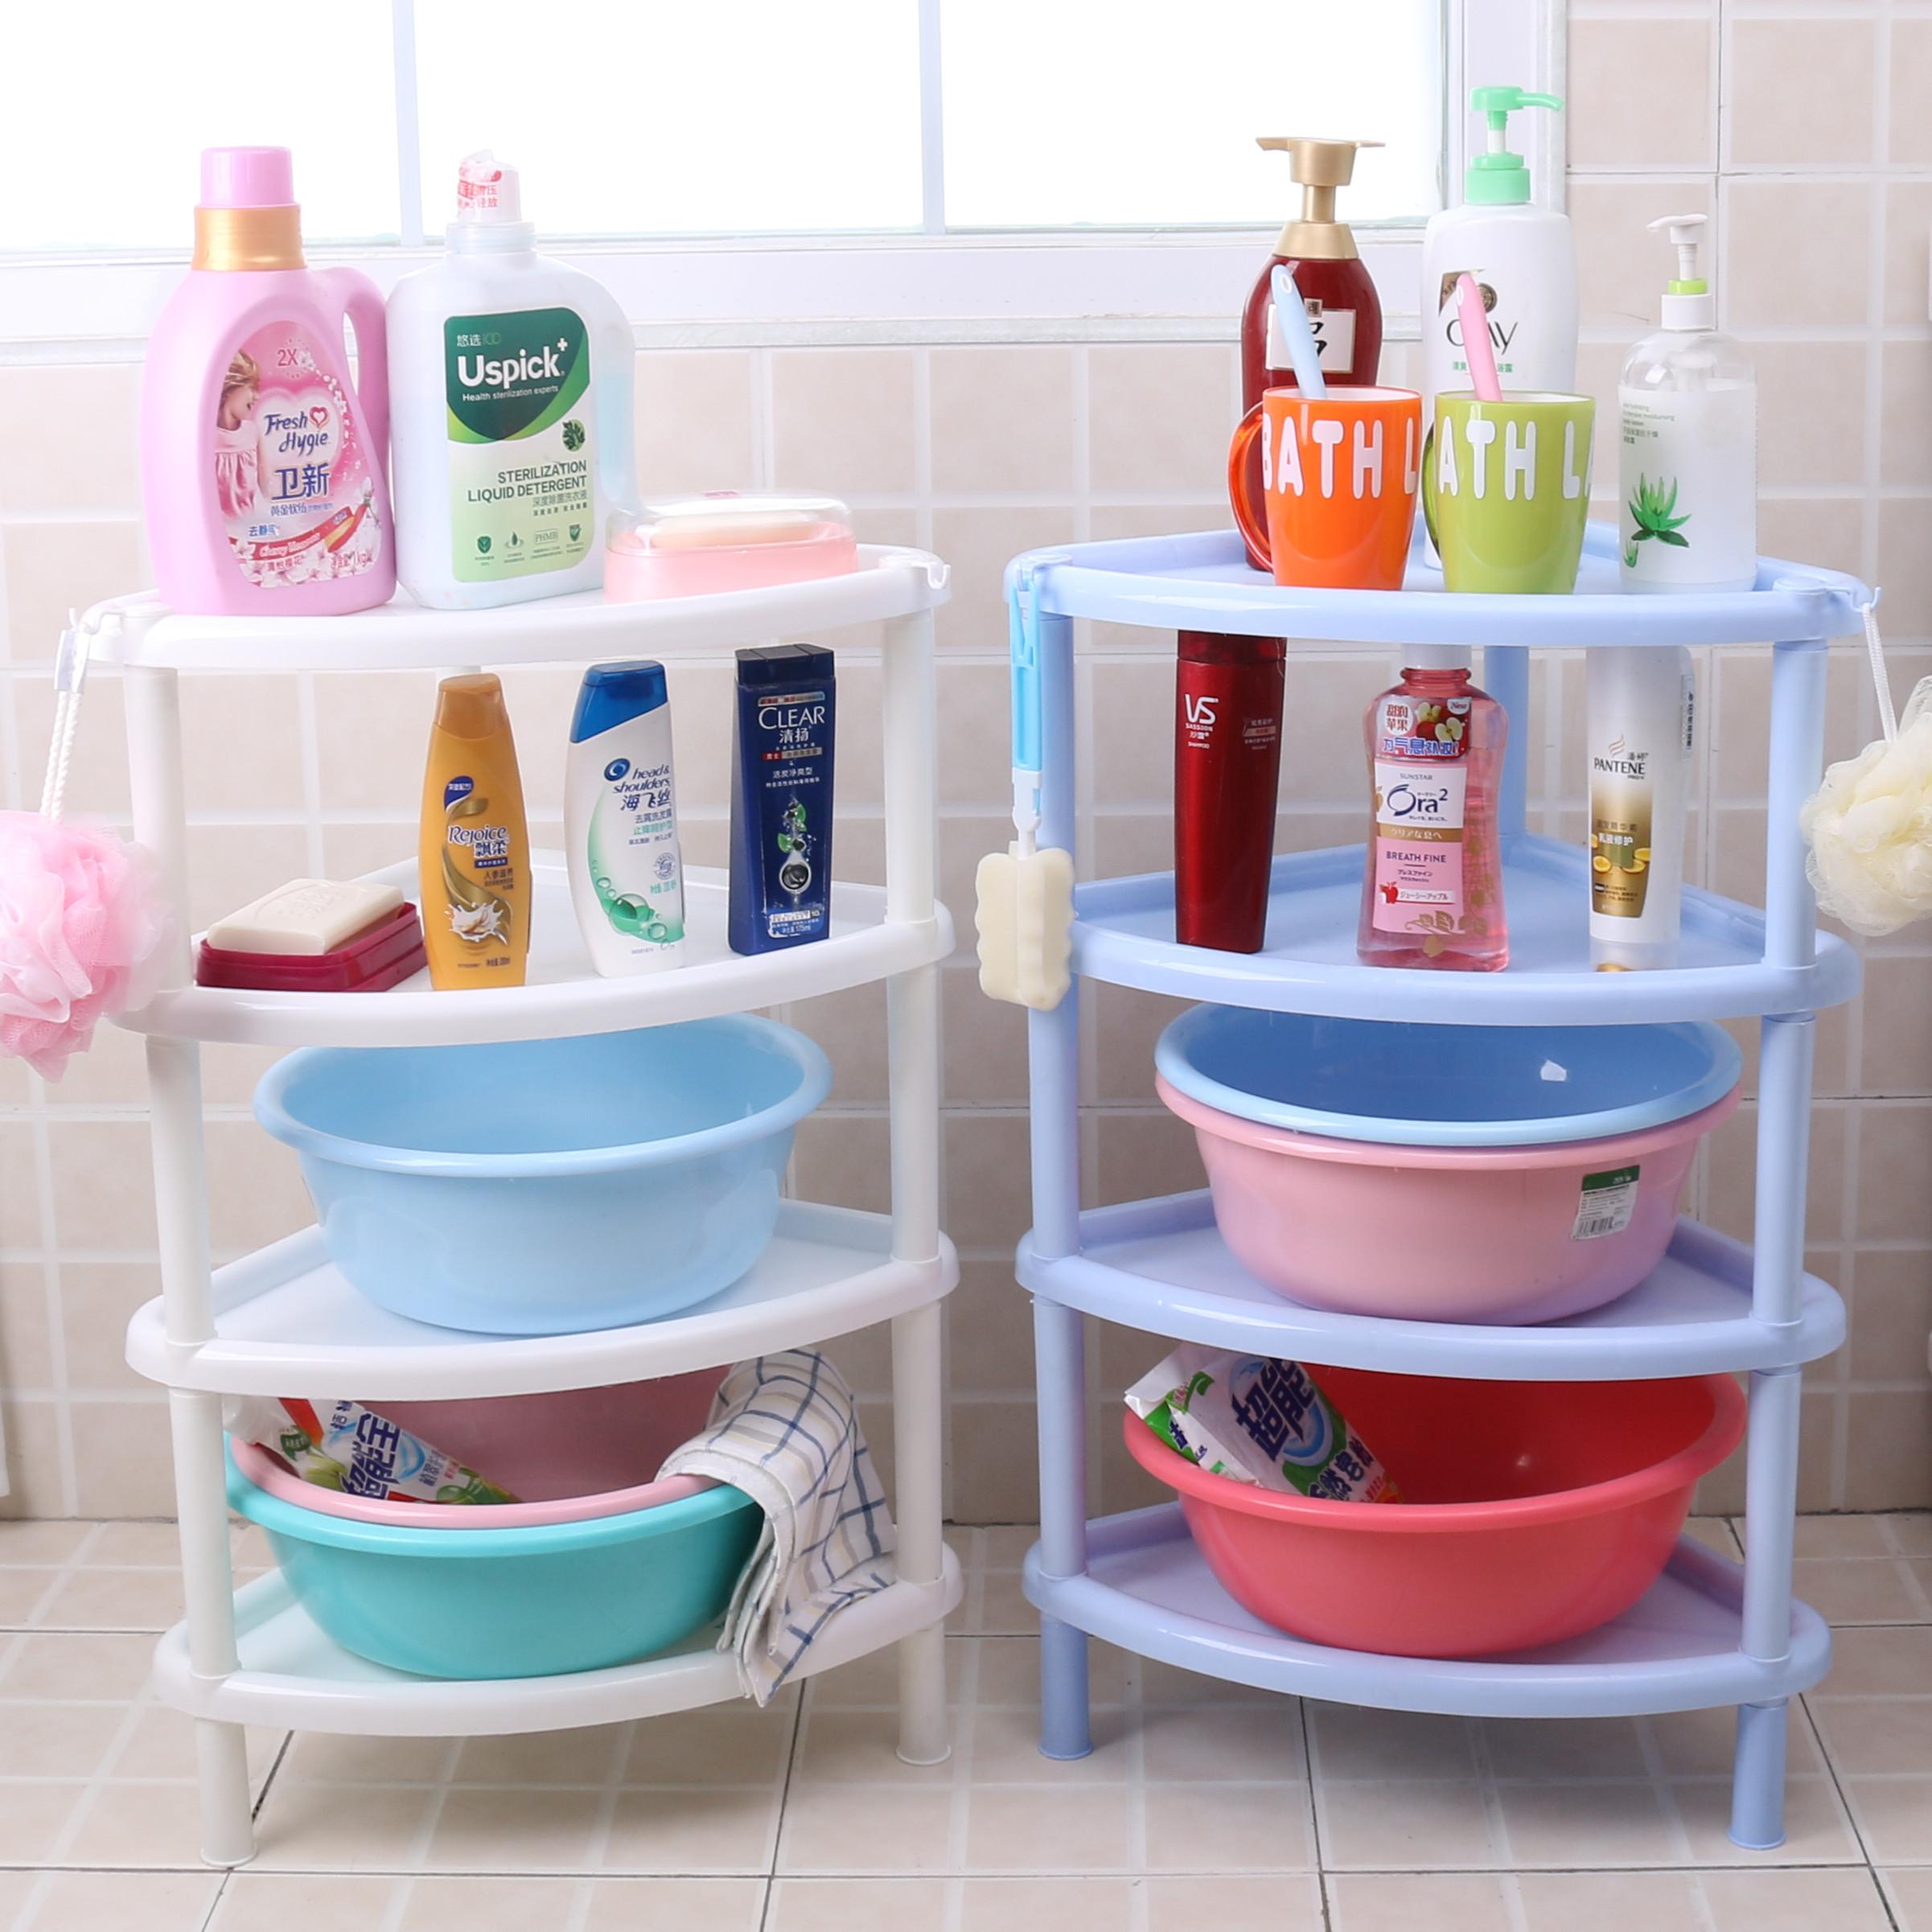 Большая ванная комната ванная полка умывальник подставка штатив пластик пол умывальник кухня хранения угловая рама